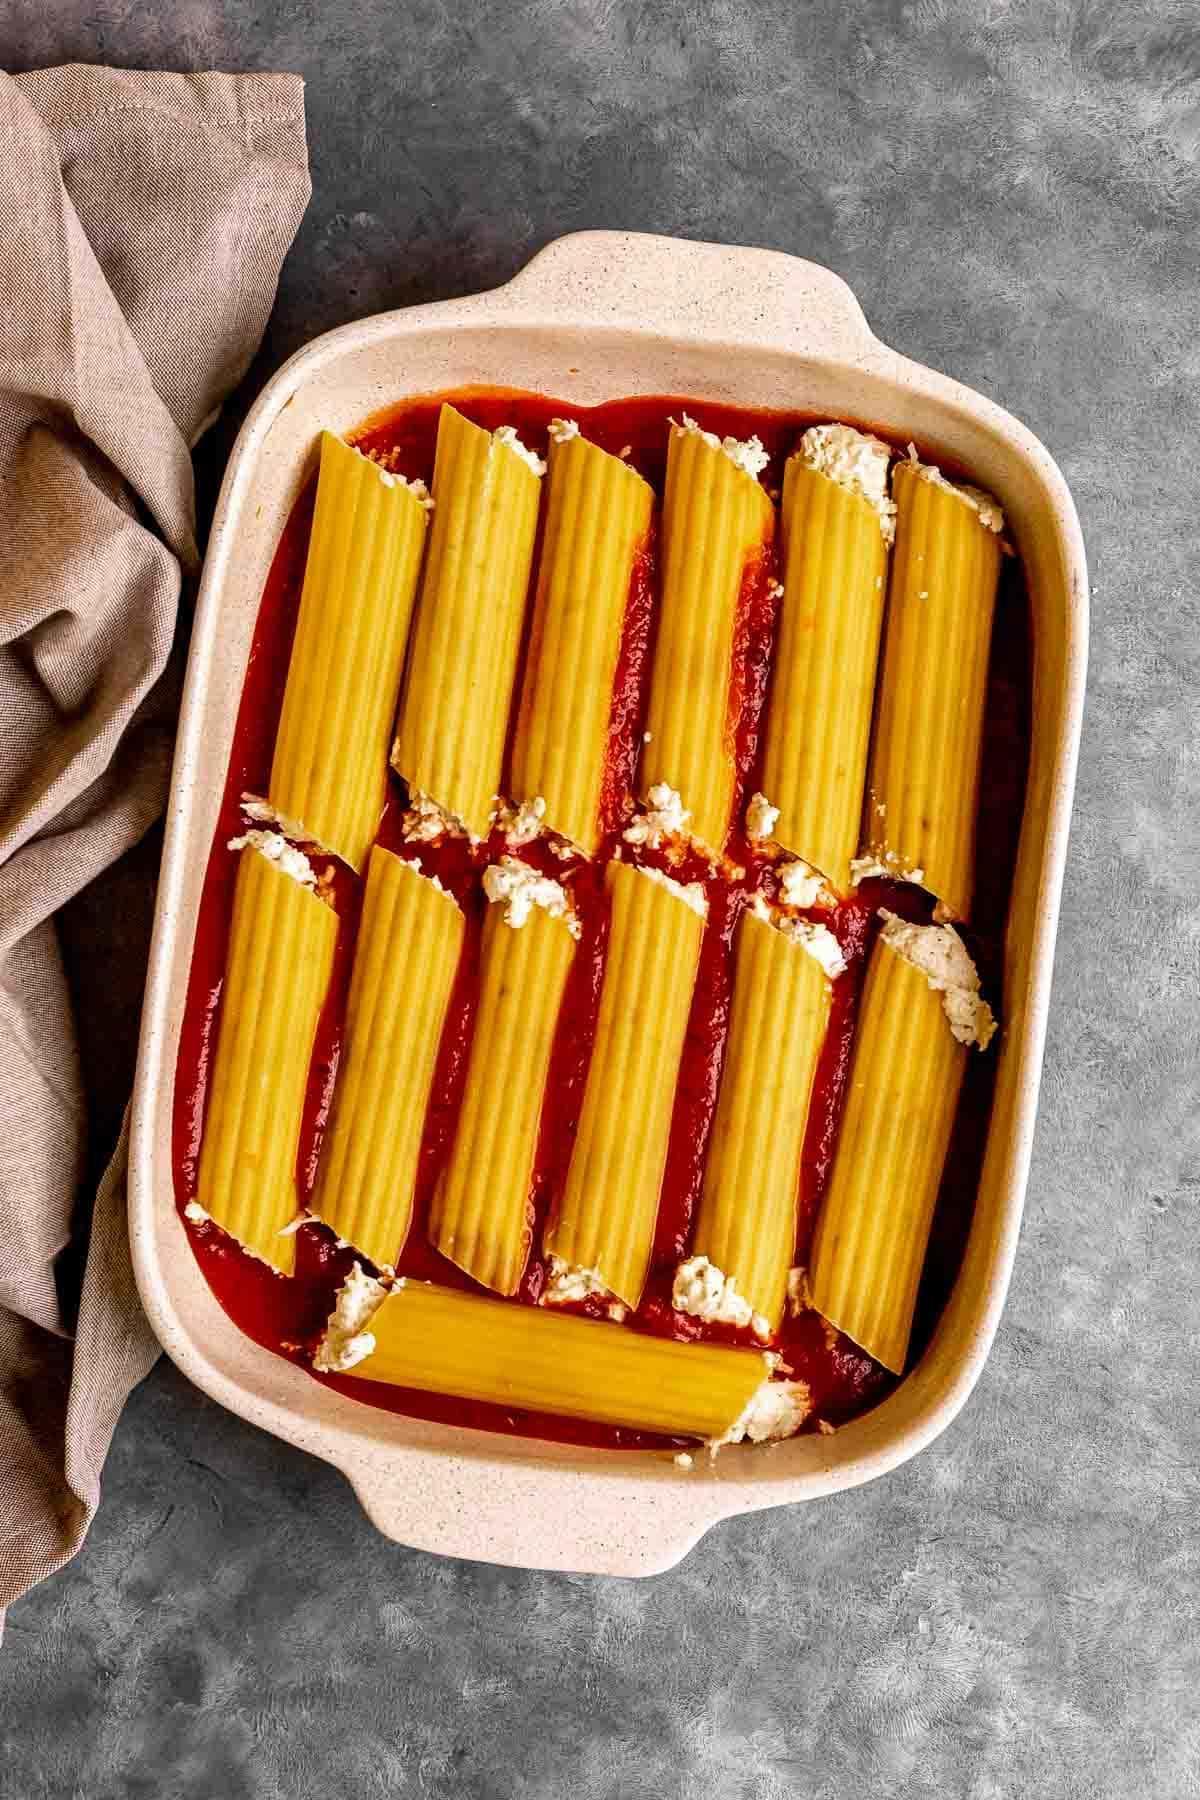 Million Dollar Manicotti noodle layer in baking dish